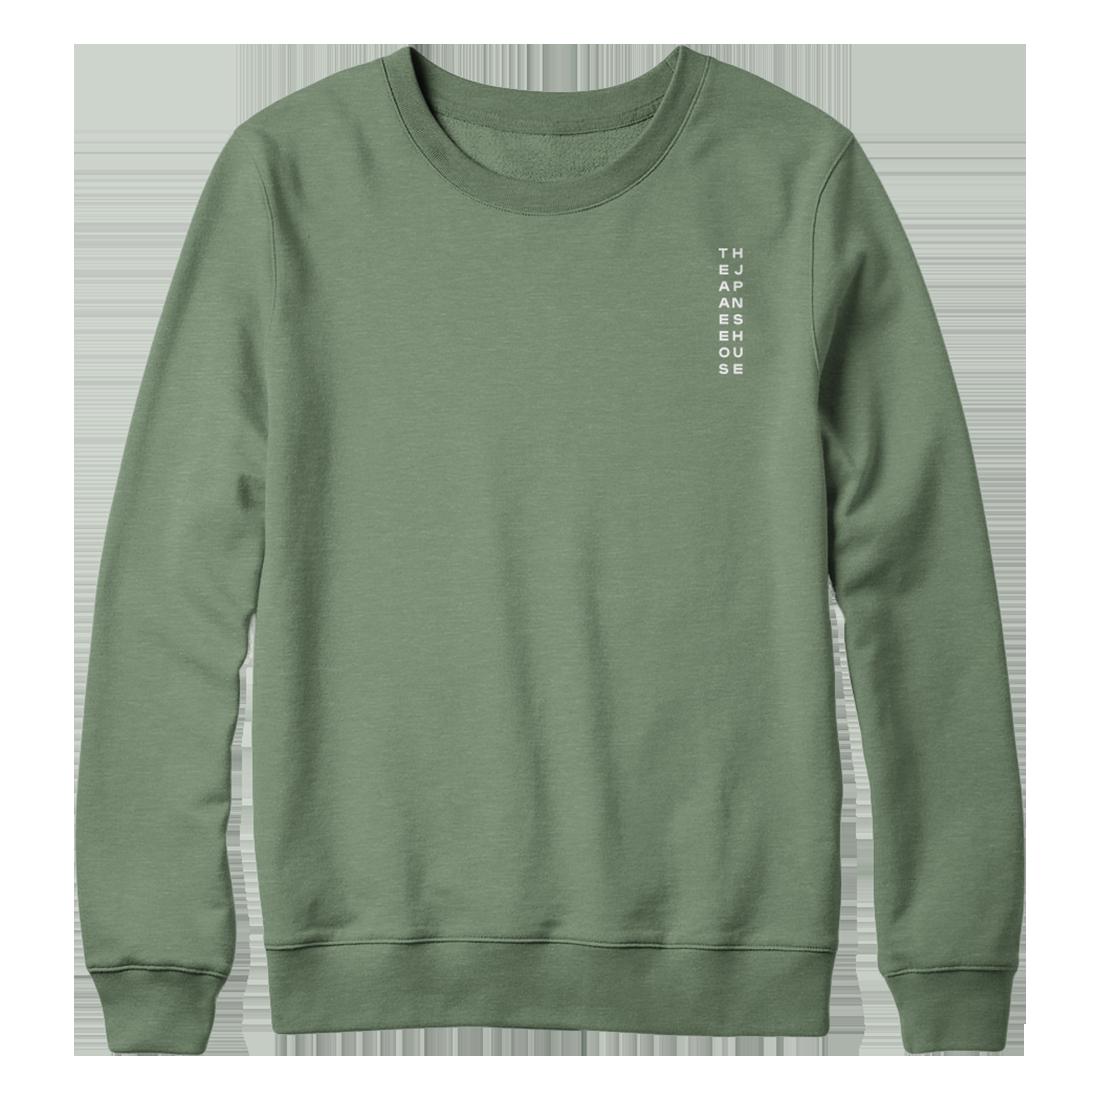 The Japanese House: Green Longsleeve Sweater